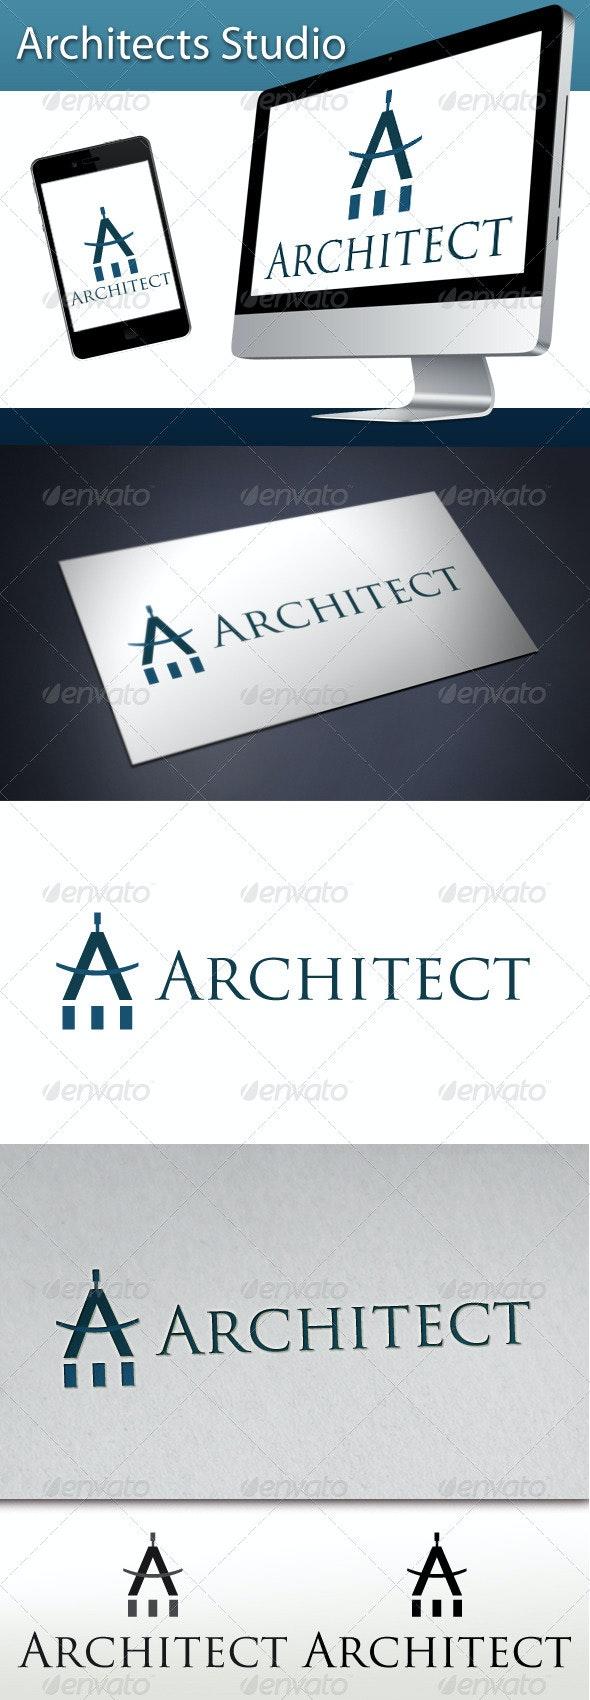 Architects Studio Logo 1 - Letters Logo Templates